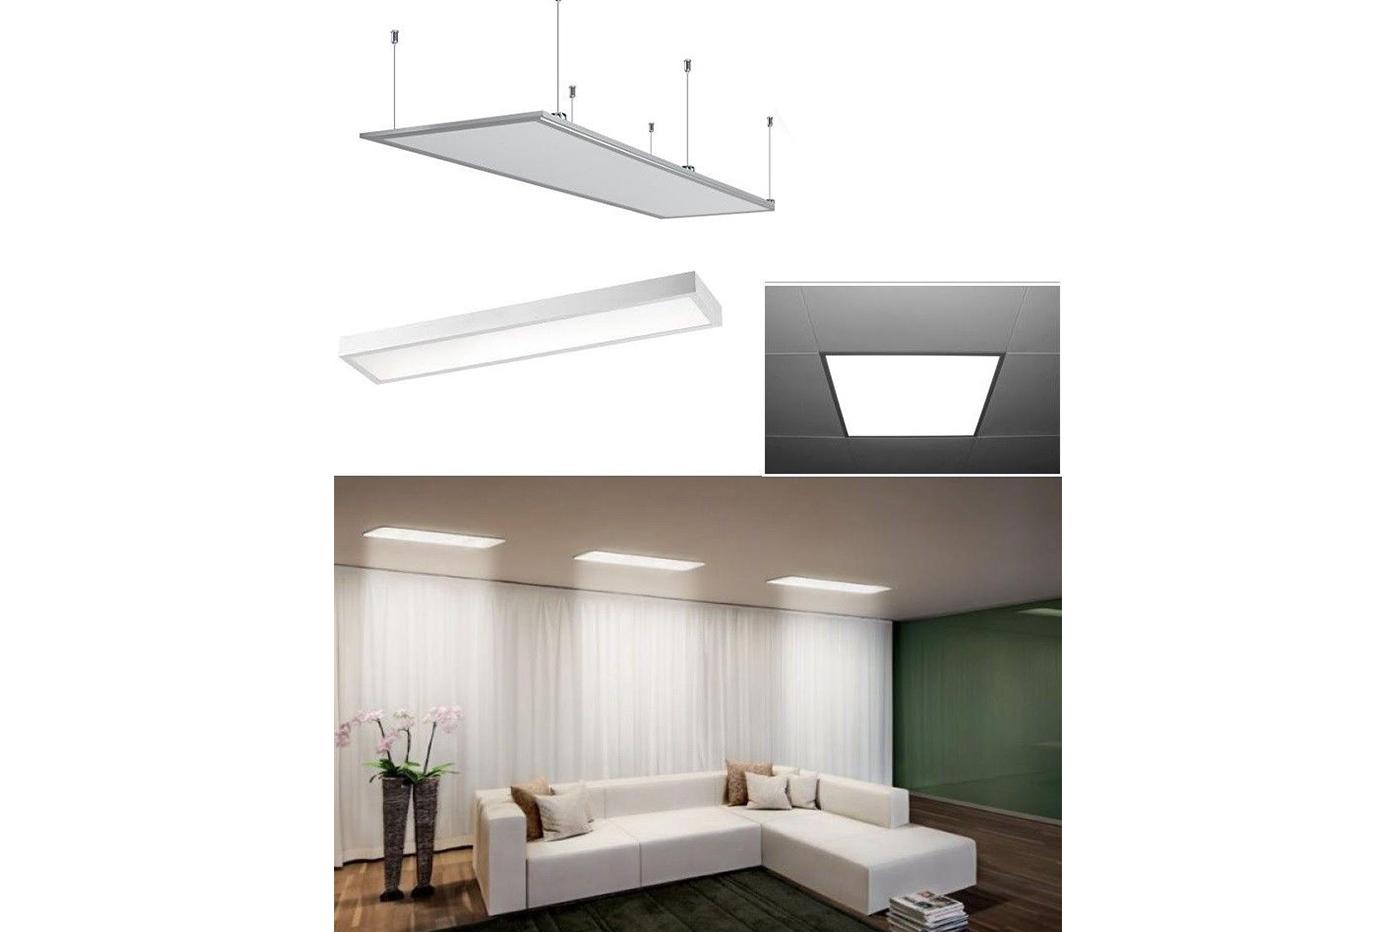 Plafoniera Led Luce Fredda : Pannello led 120 x 60 74w plafoniera soffitto luce fredda cornice